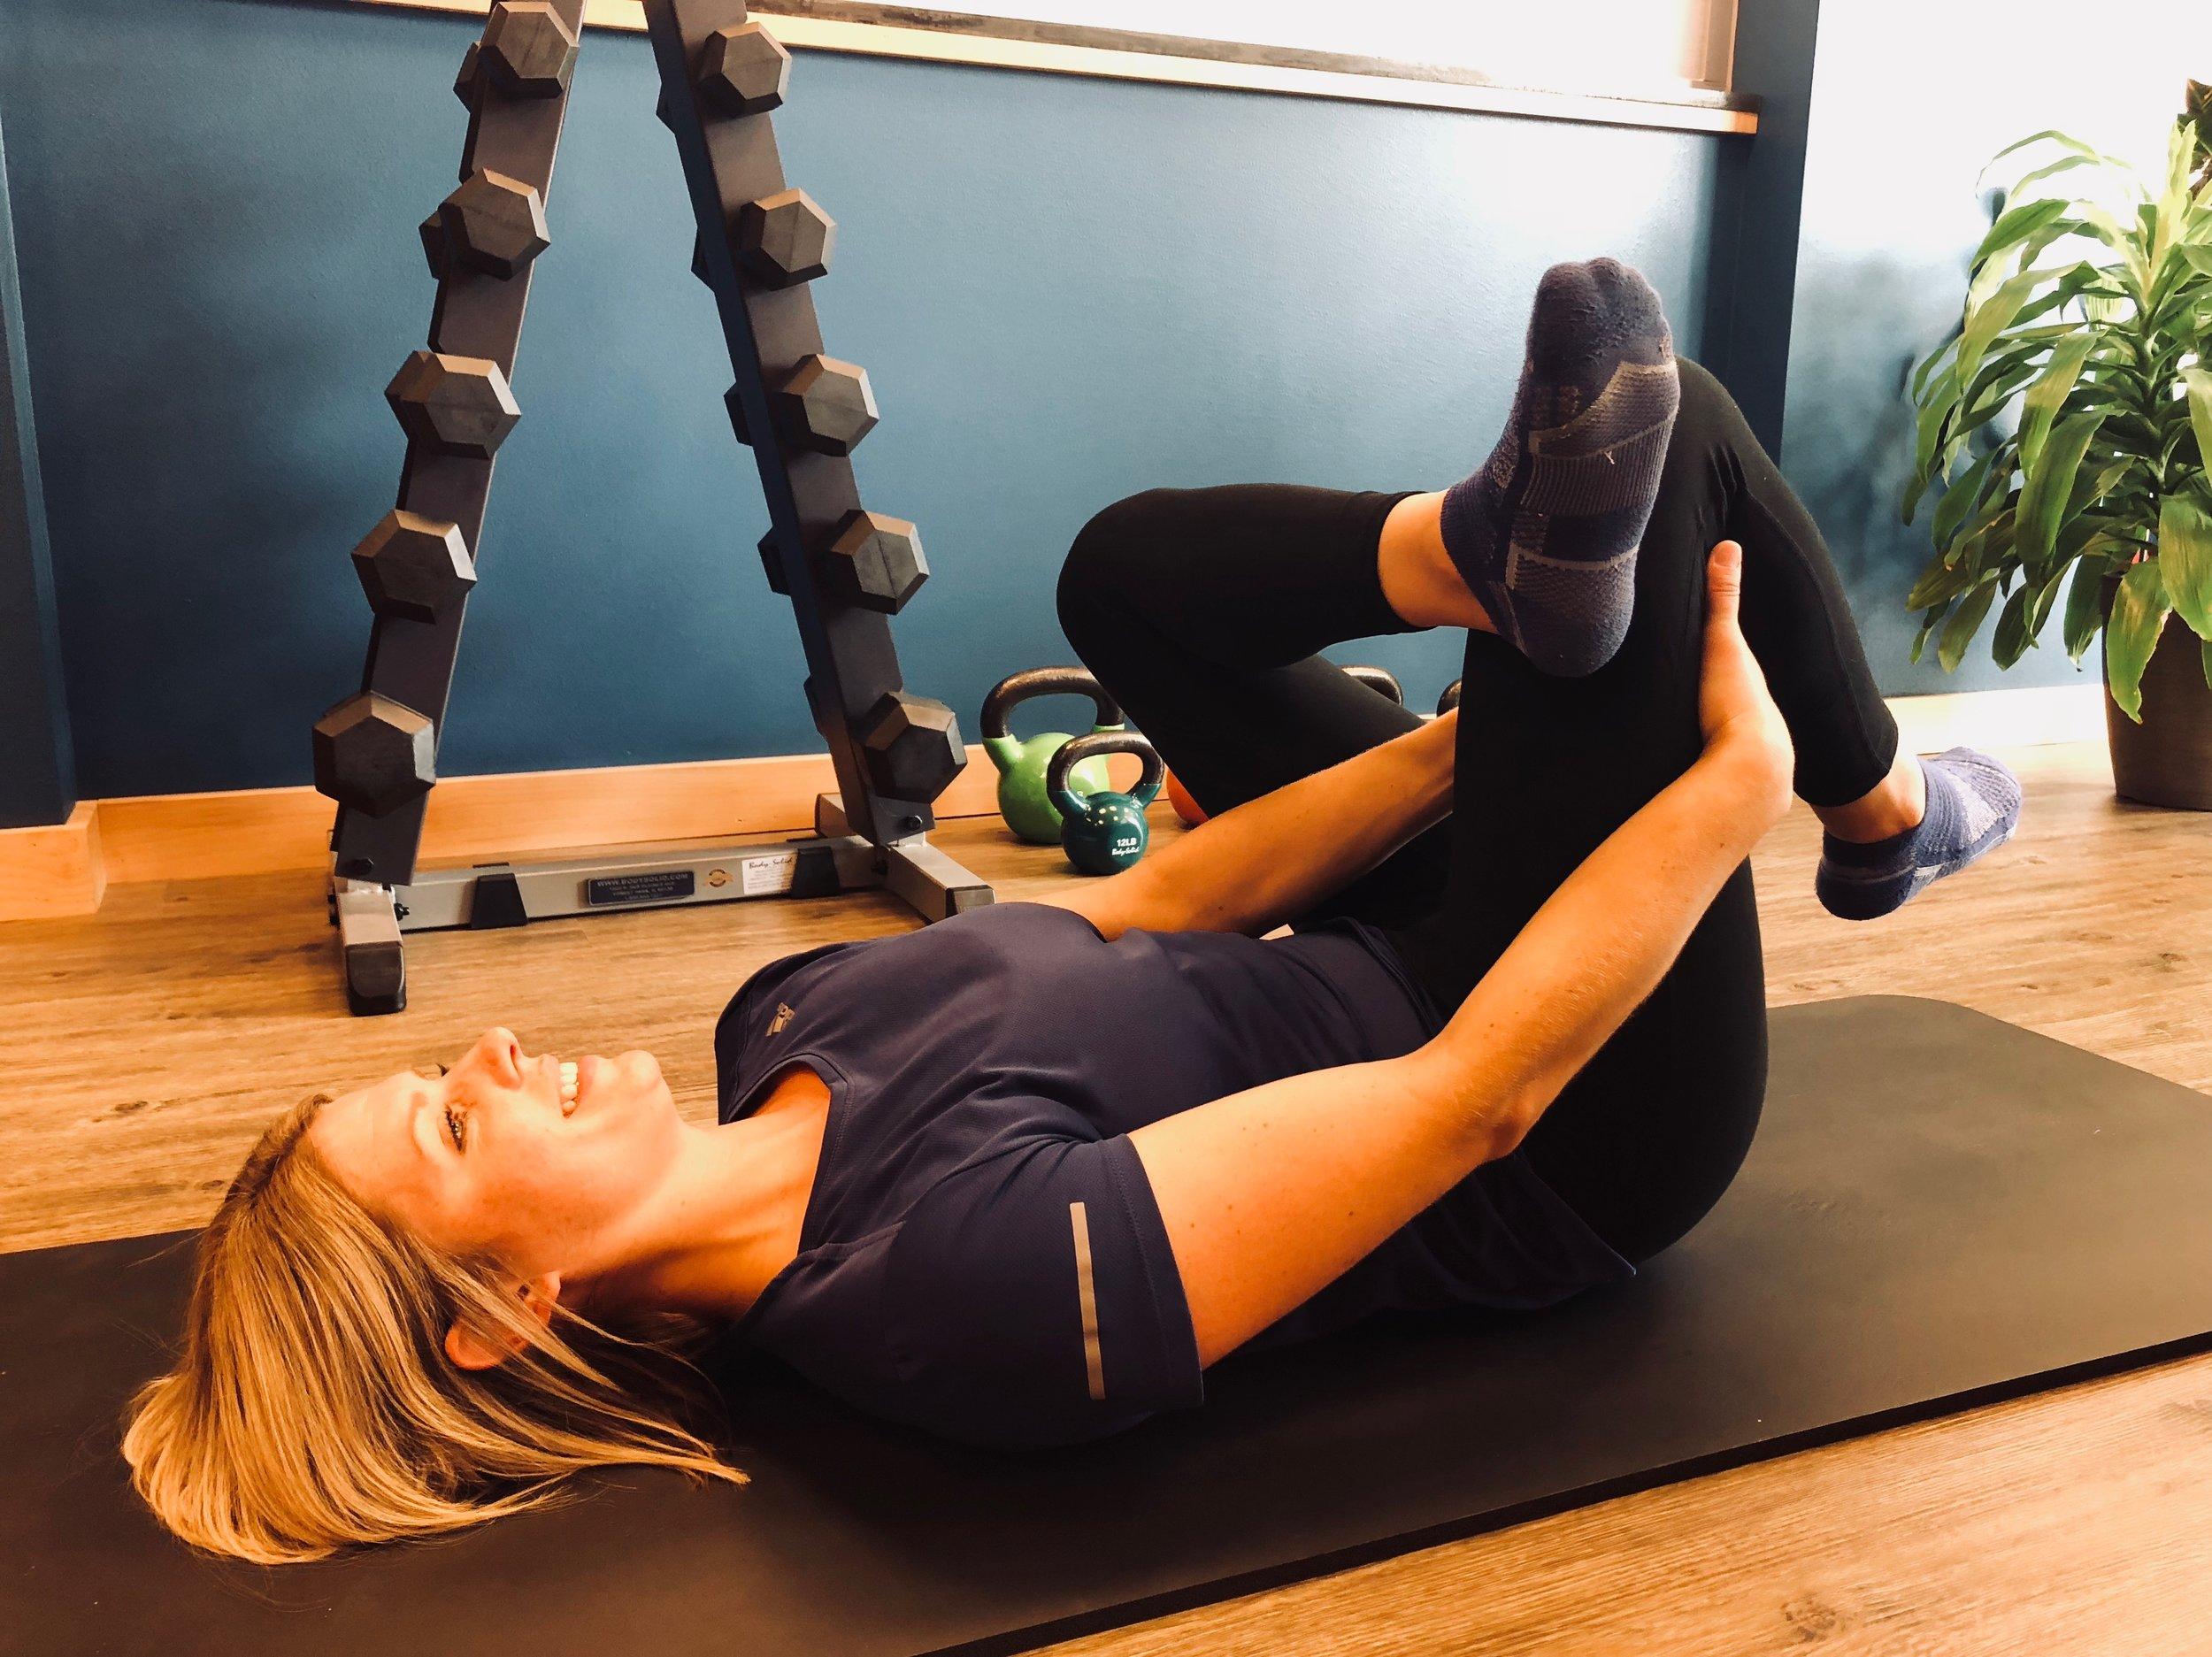 Figure Four Stretch - Advanced